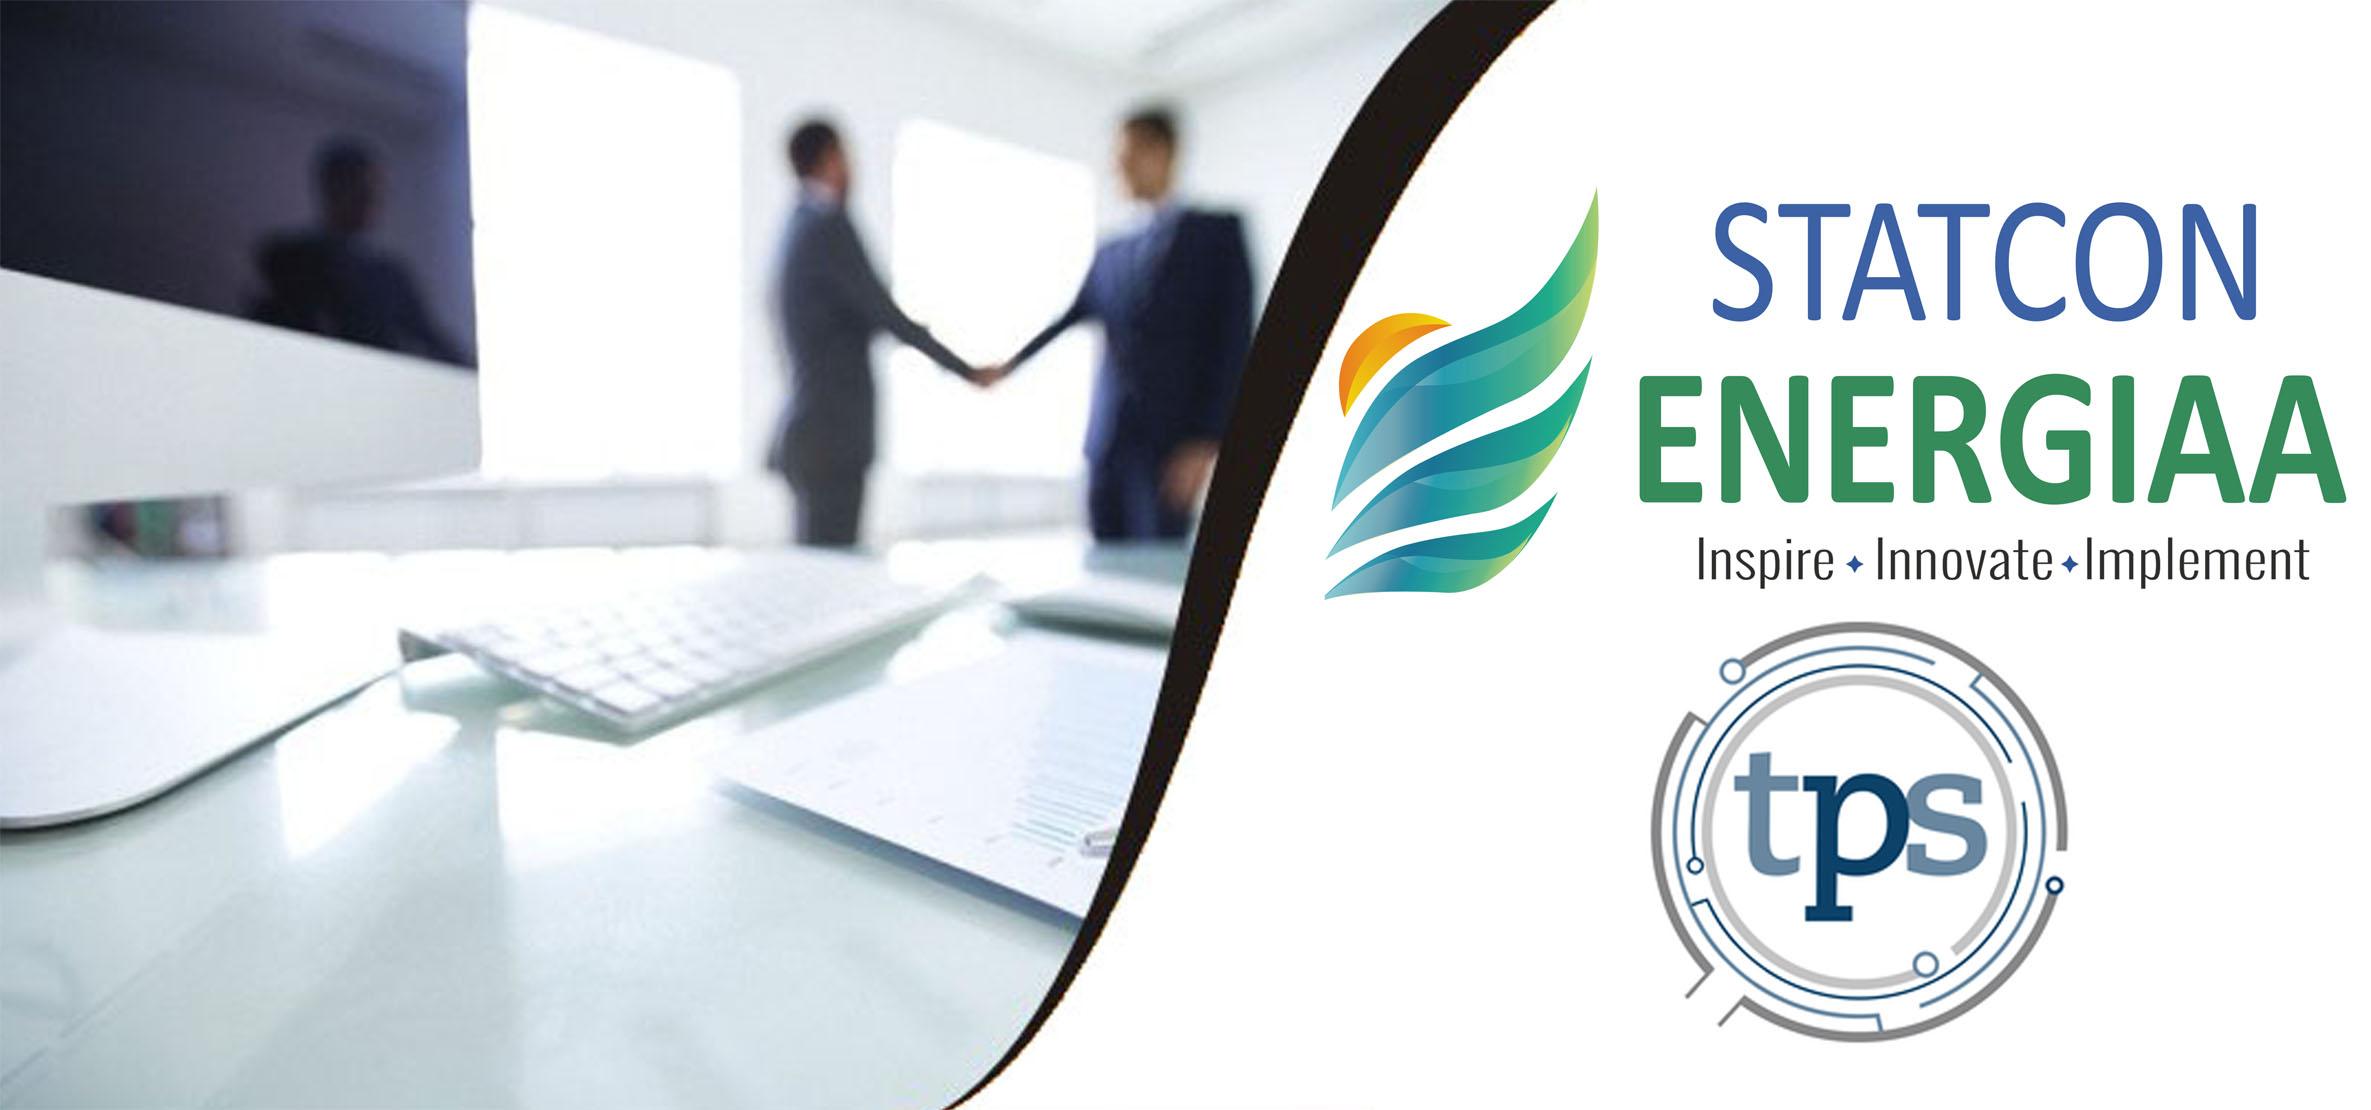 Statcon Energiaa Partnership with TPS